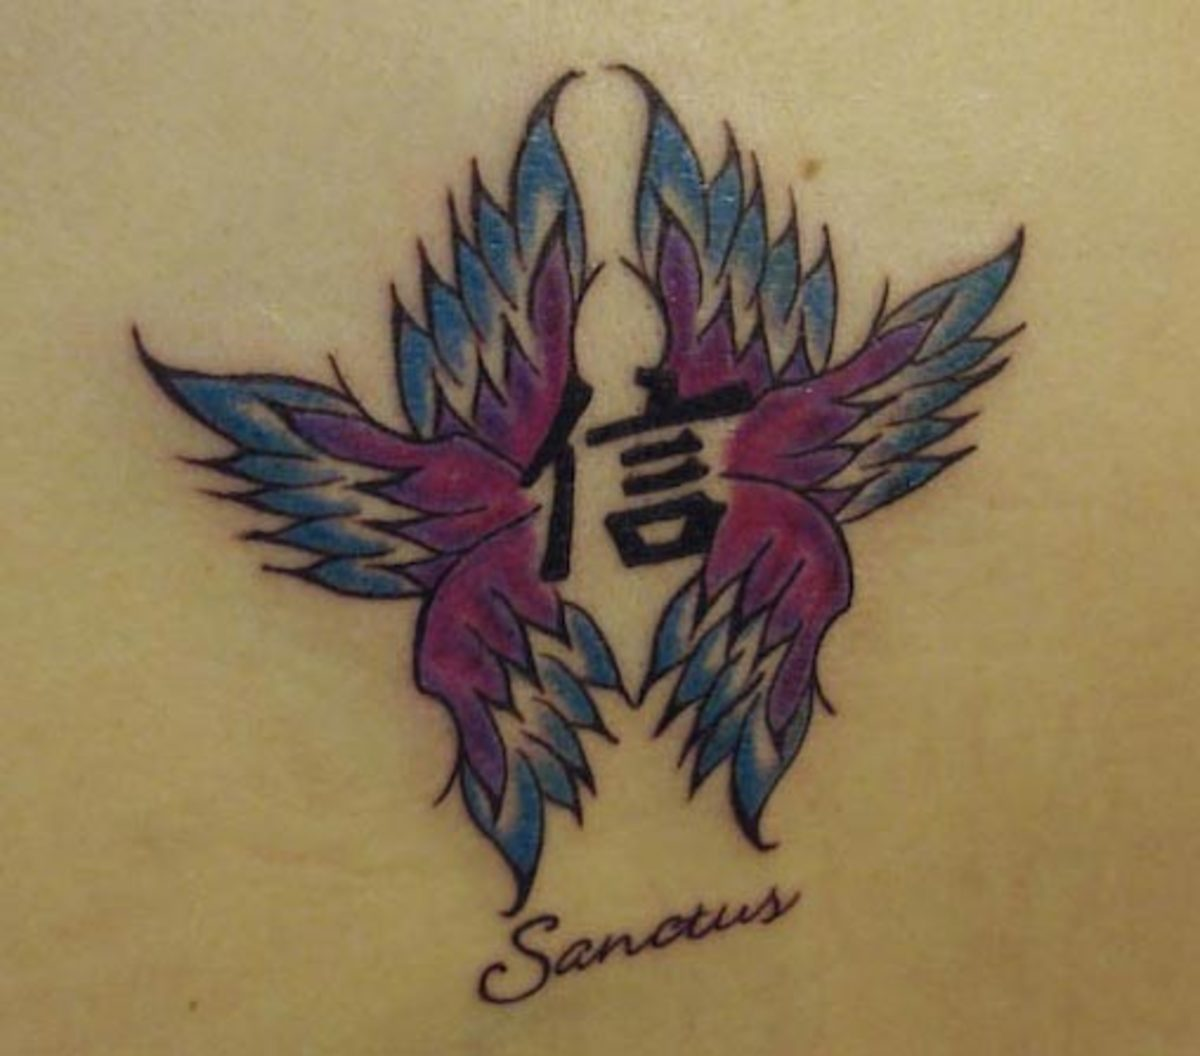 (by Makeba Ische, Cactus Tattoo, Mankato, MN)